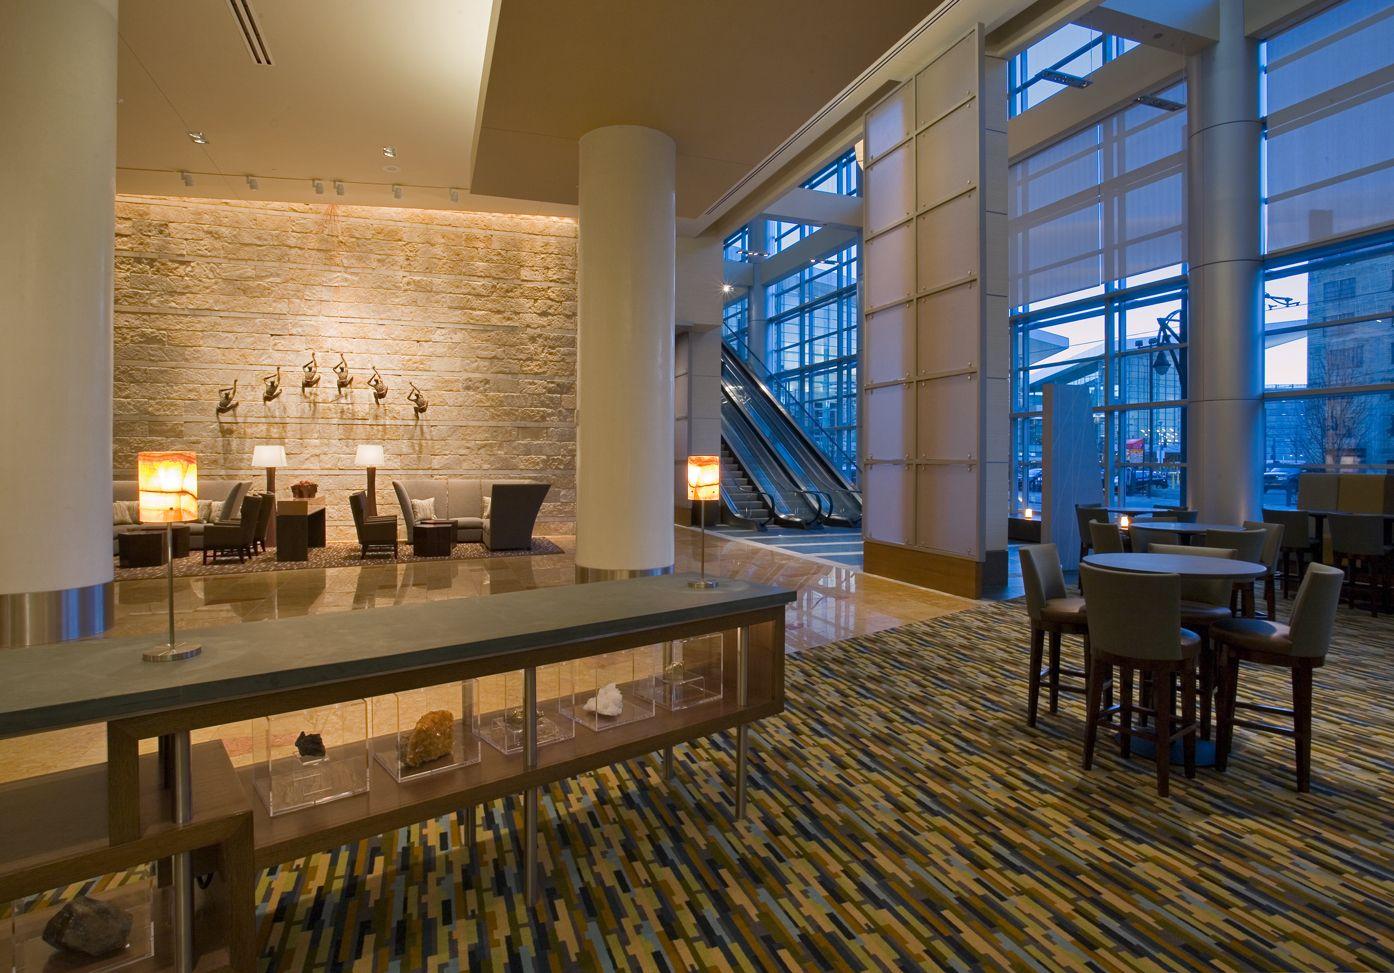 Lobby Art Hyatt Regency Denver Denver Hotels Hyatt Hotels Hotel